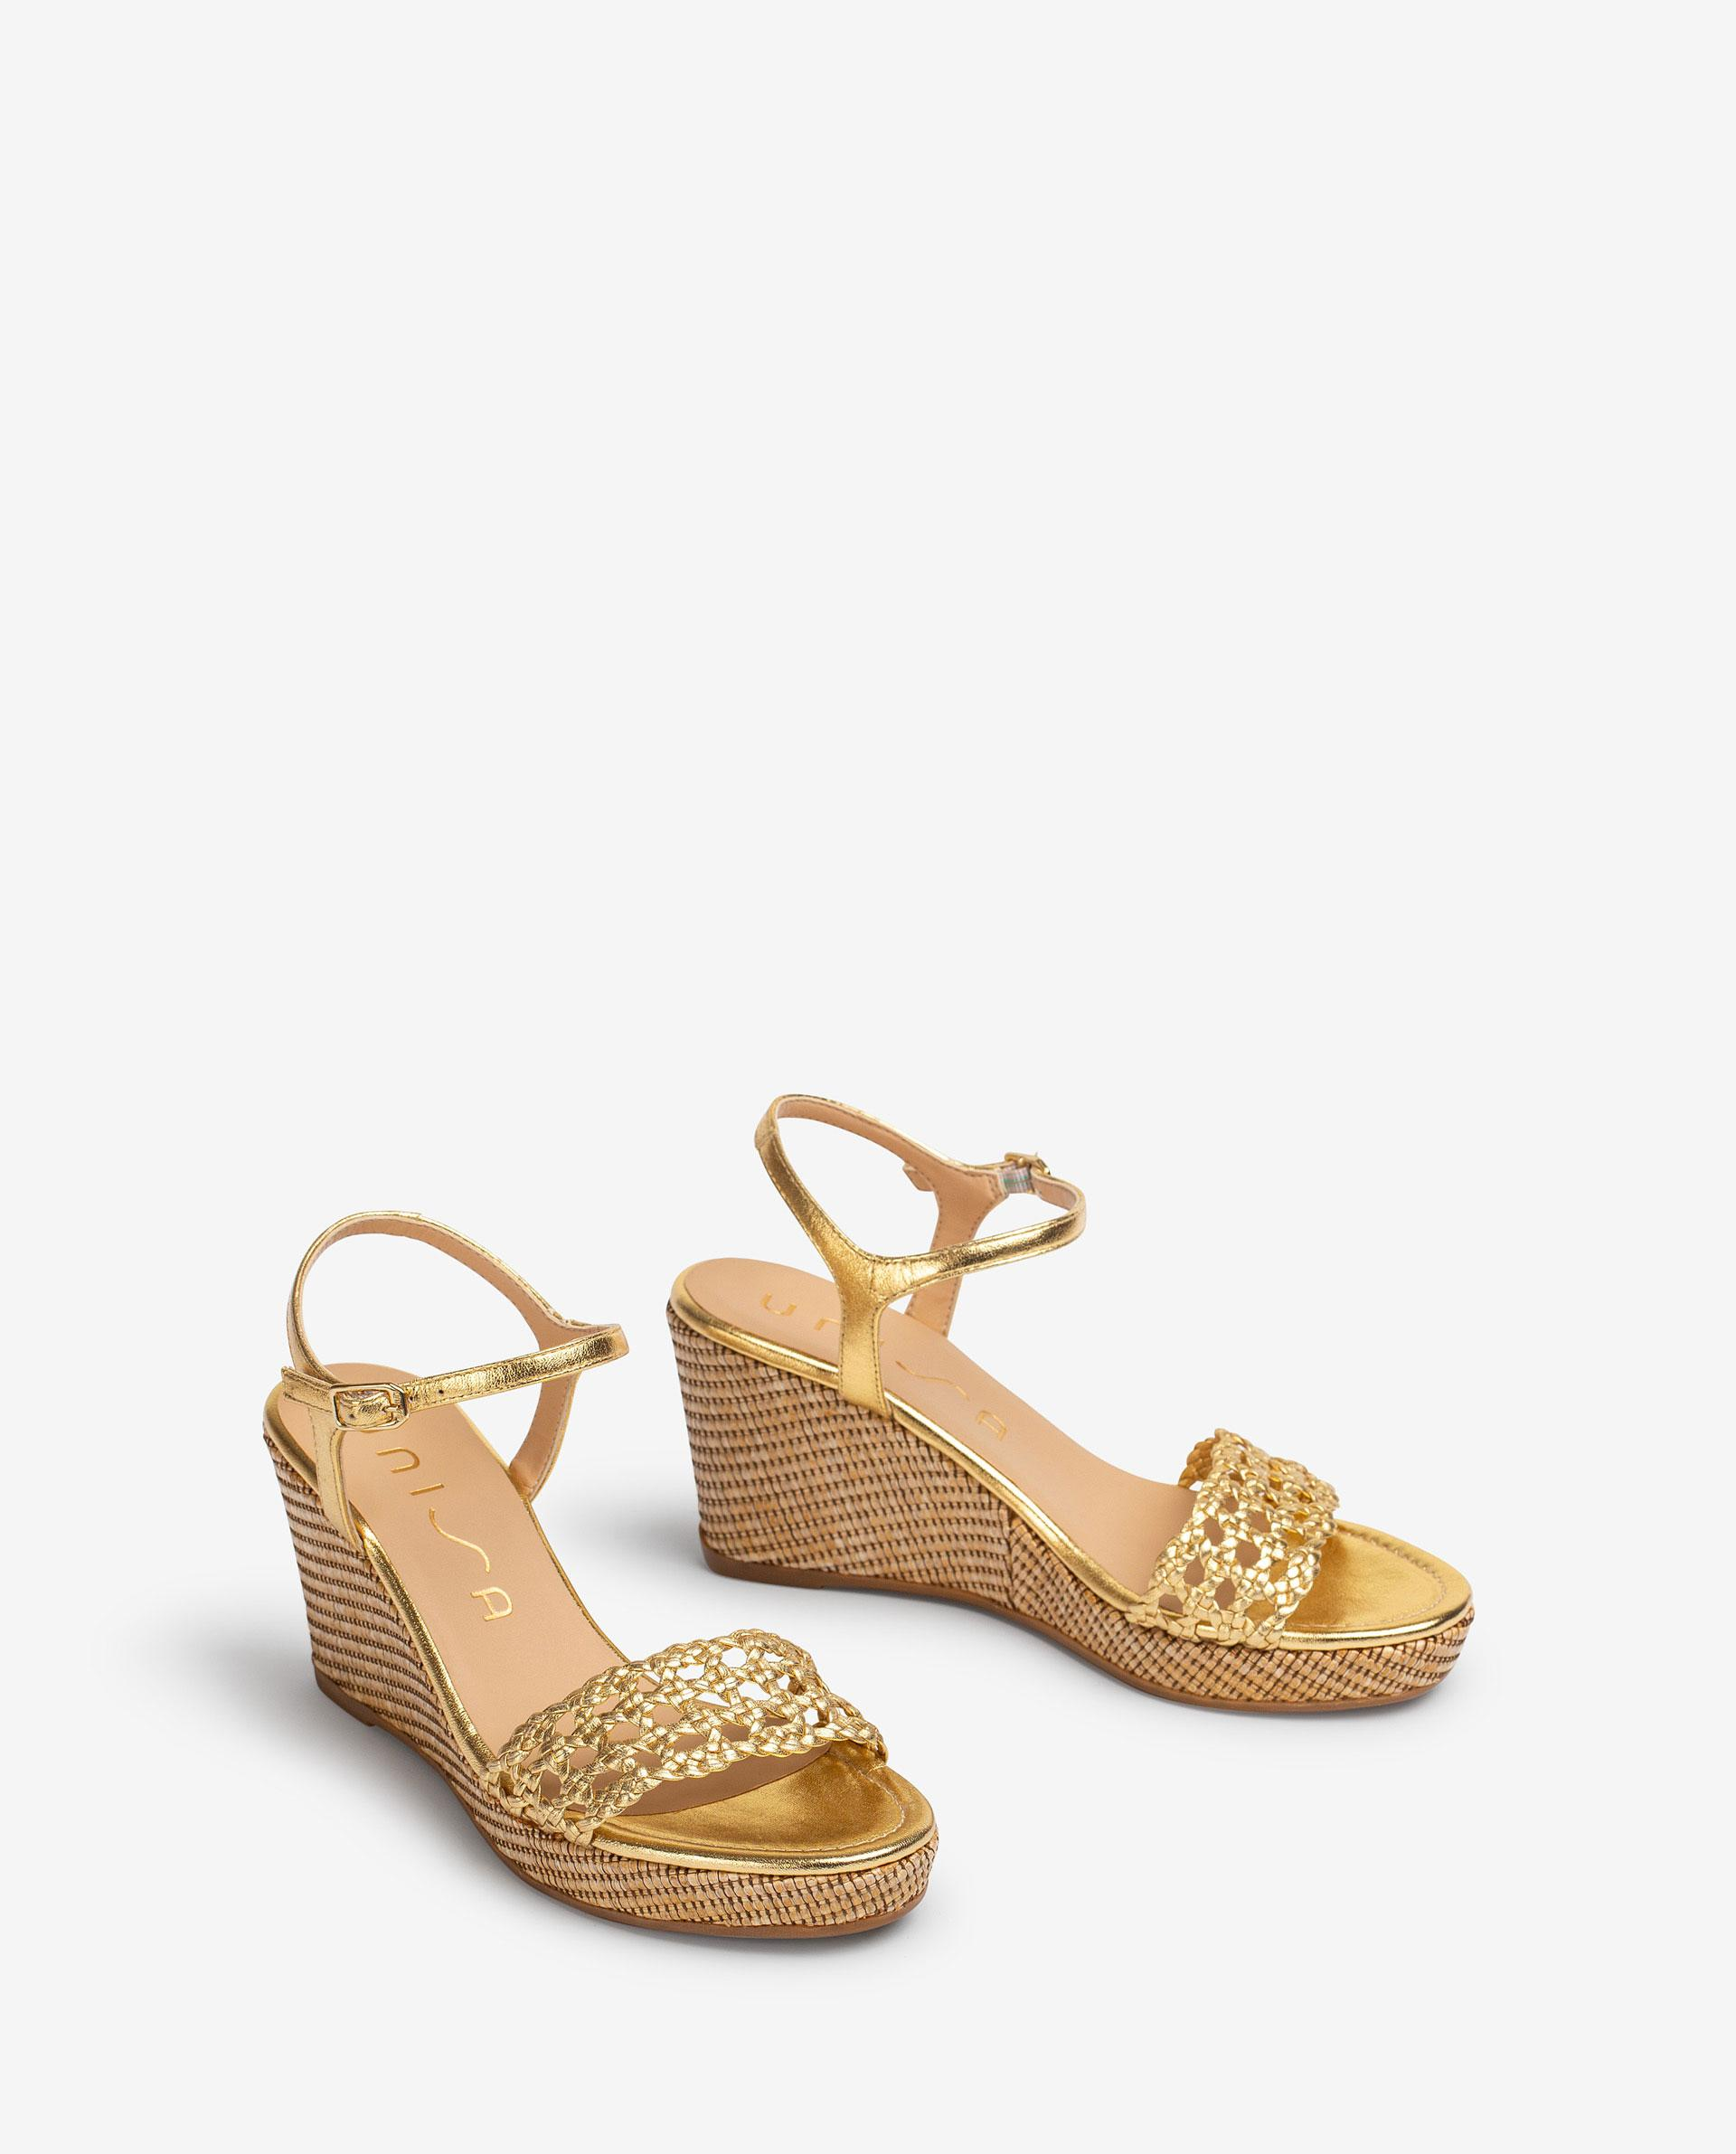 UNISA Braided metal effect leather macrame sandals LOBI_21_LMT 2